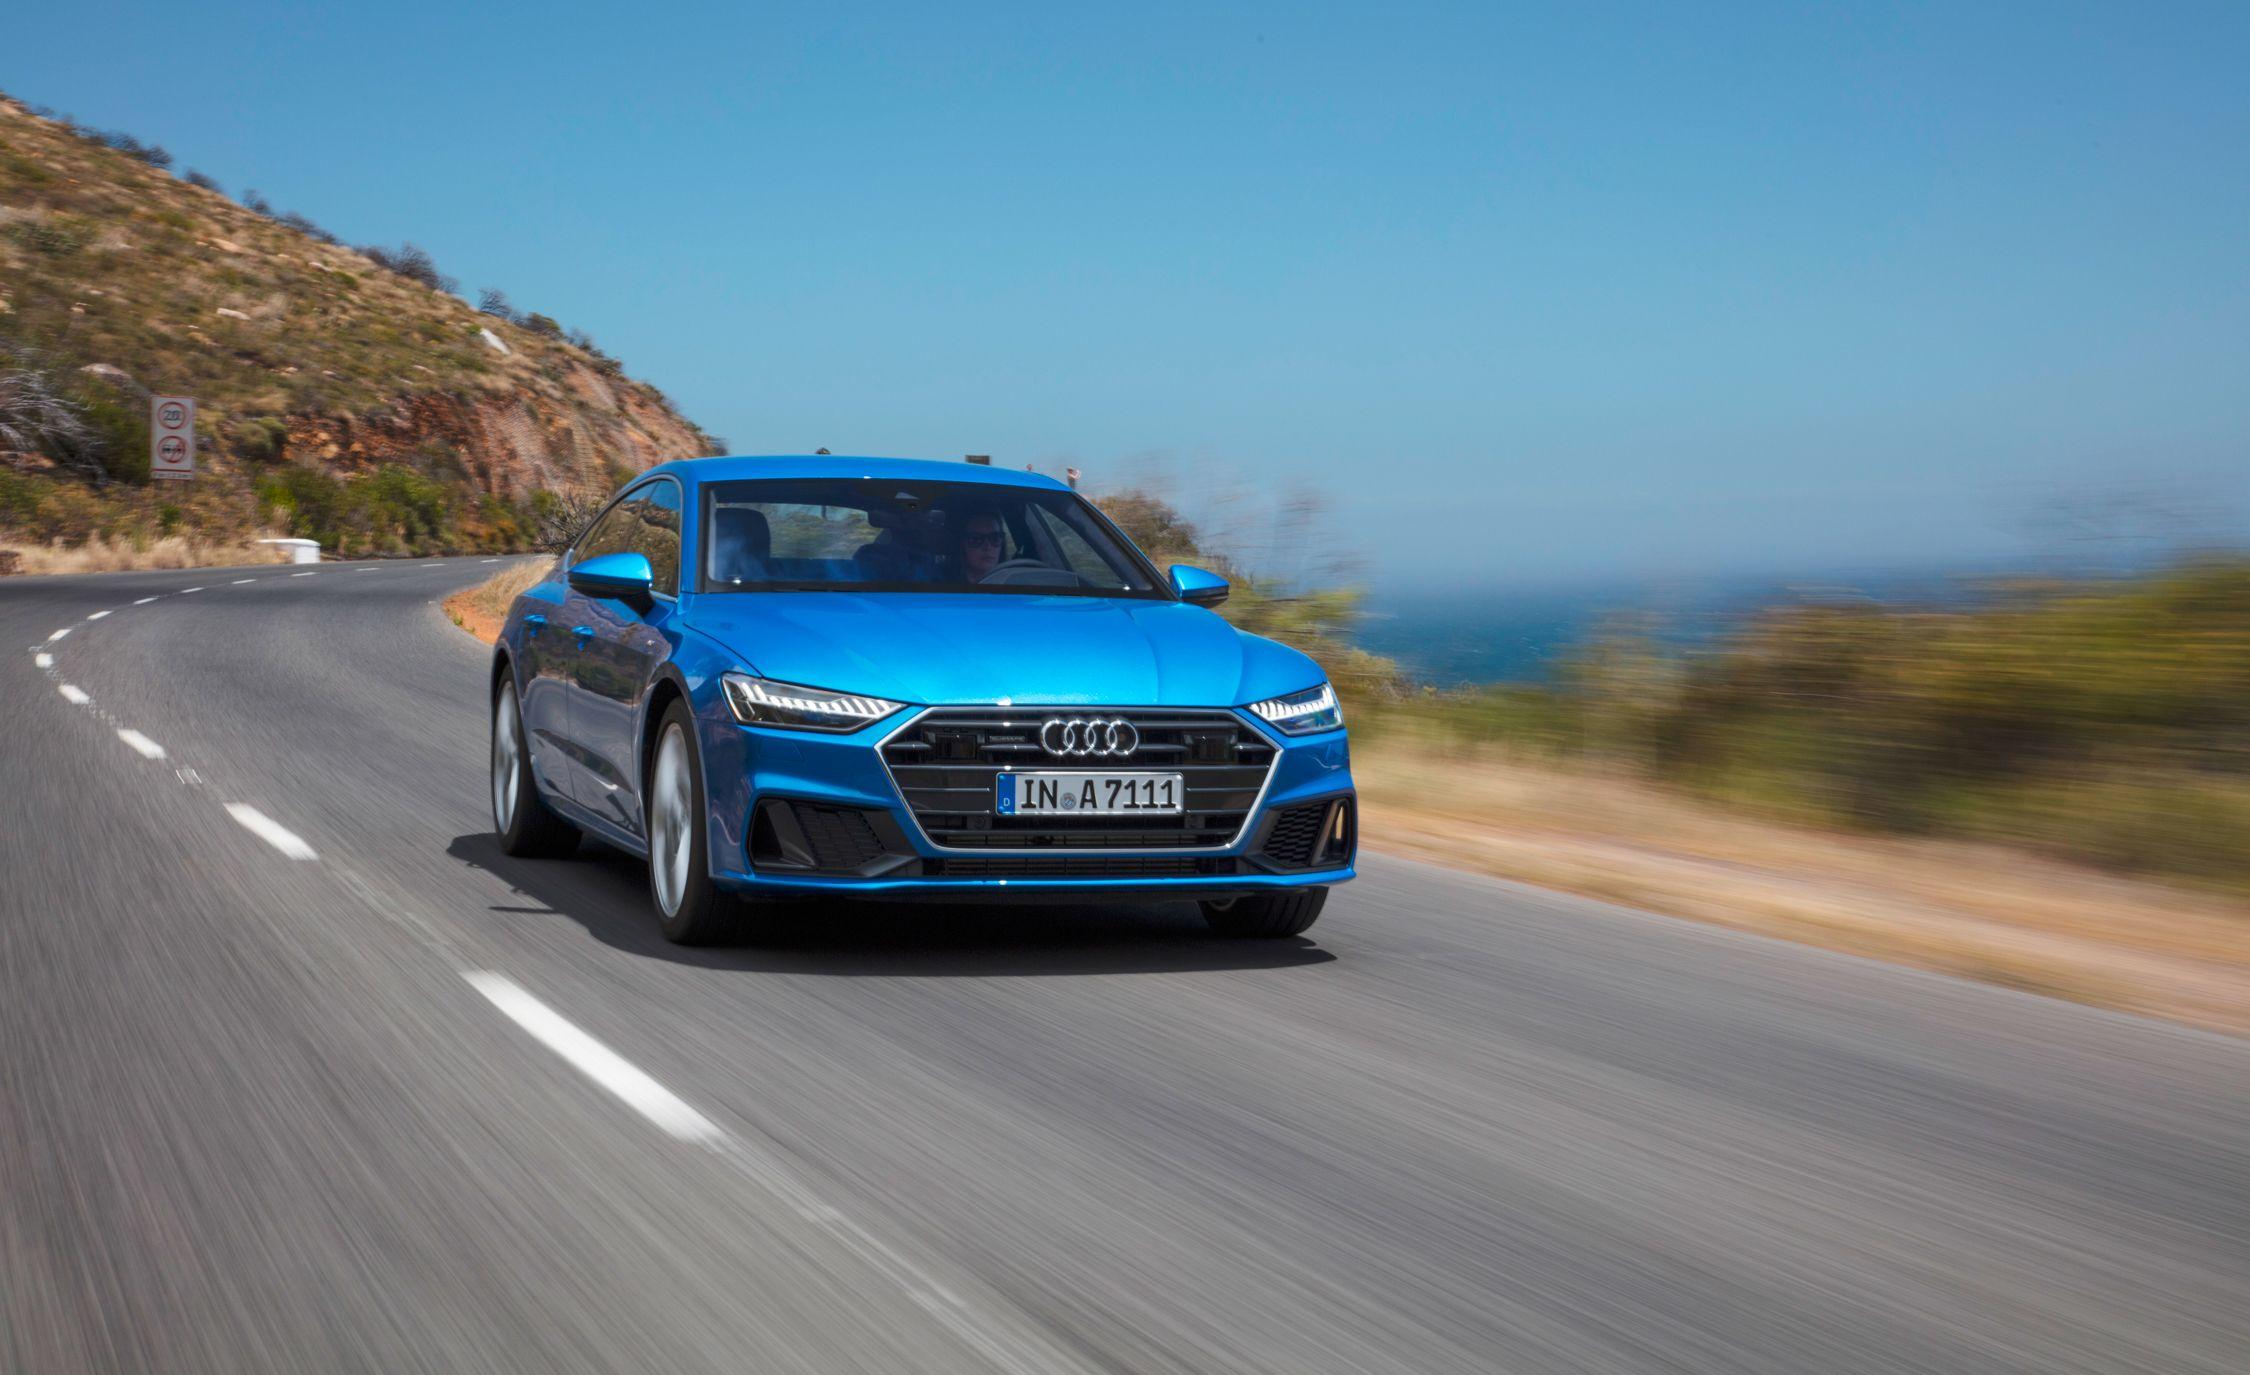 2019-Audi-A7-Sportback-108-1.jpg